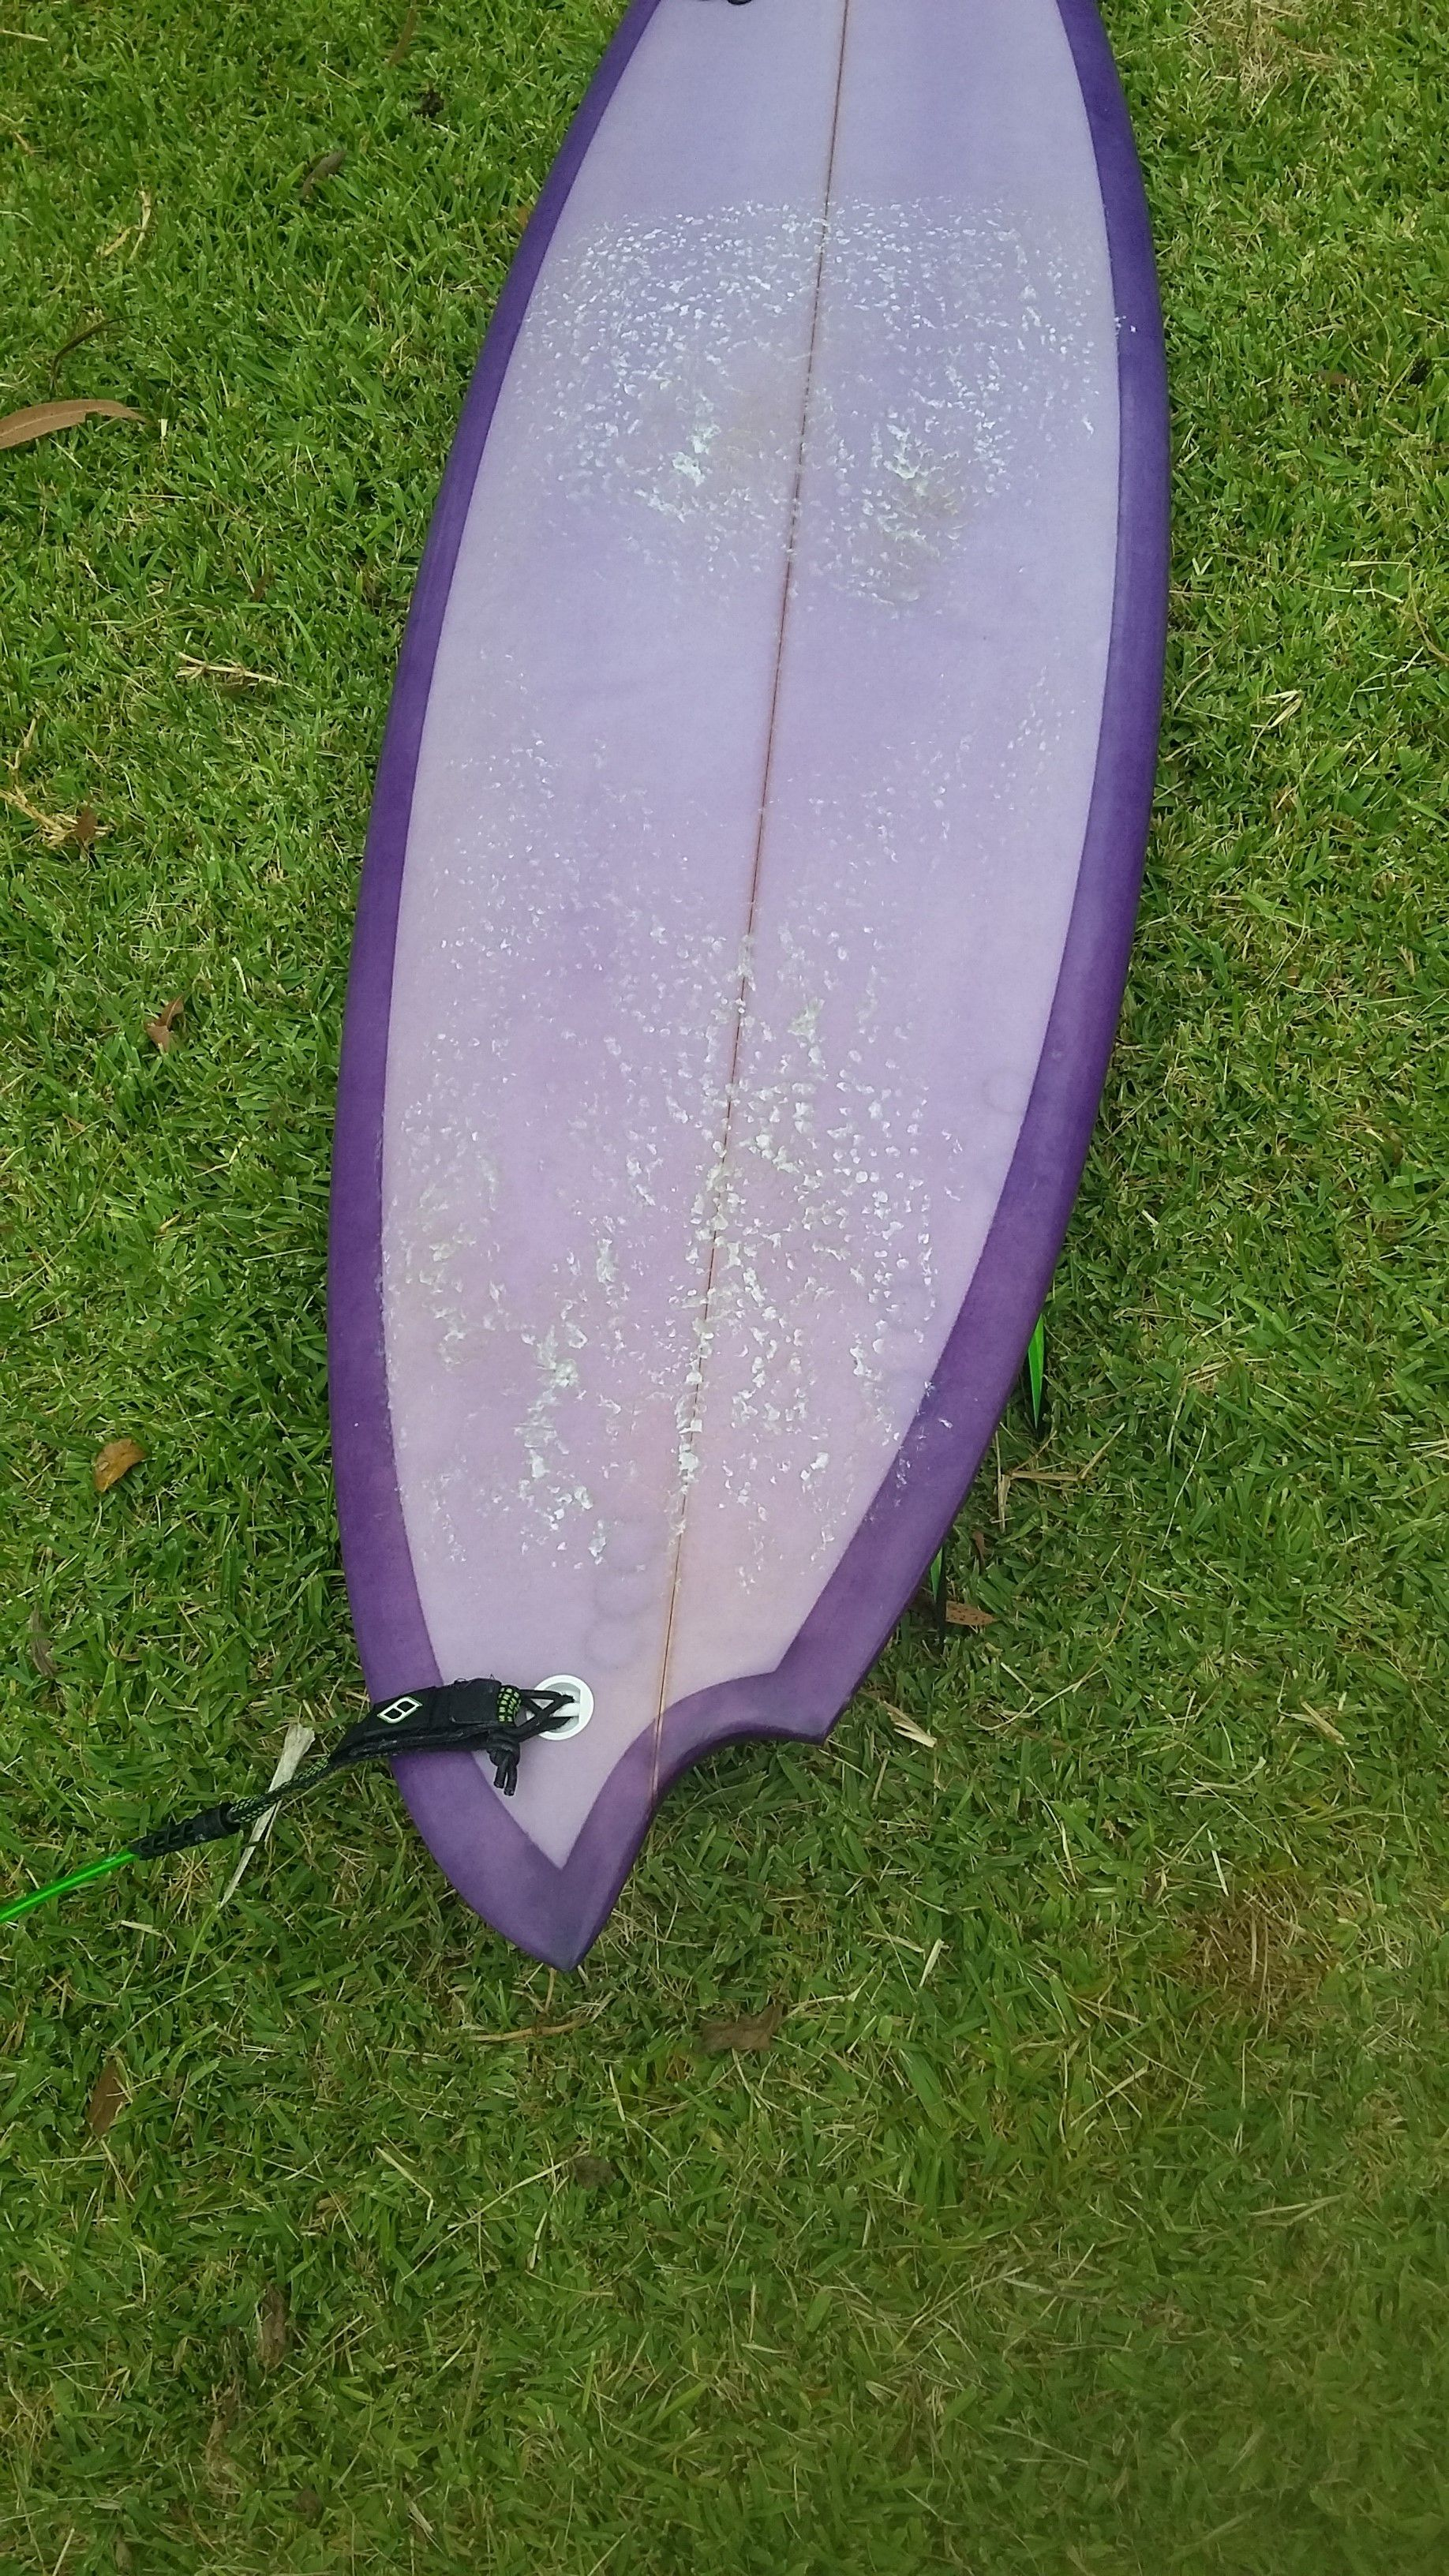 Swaylocks Com Surfboard Design Surfboard Surfing